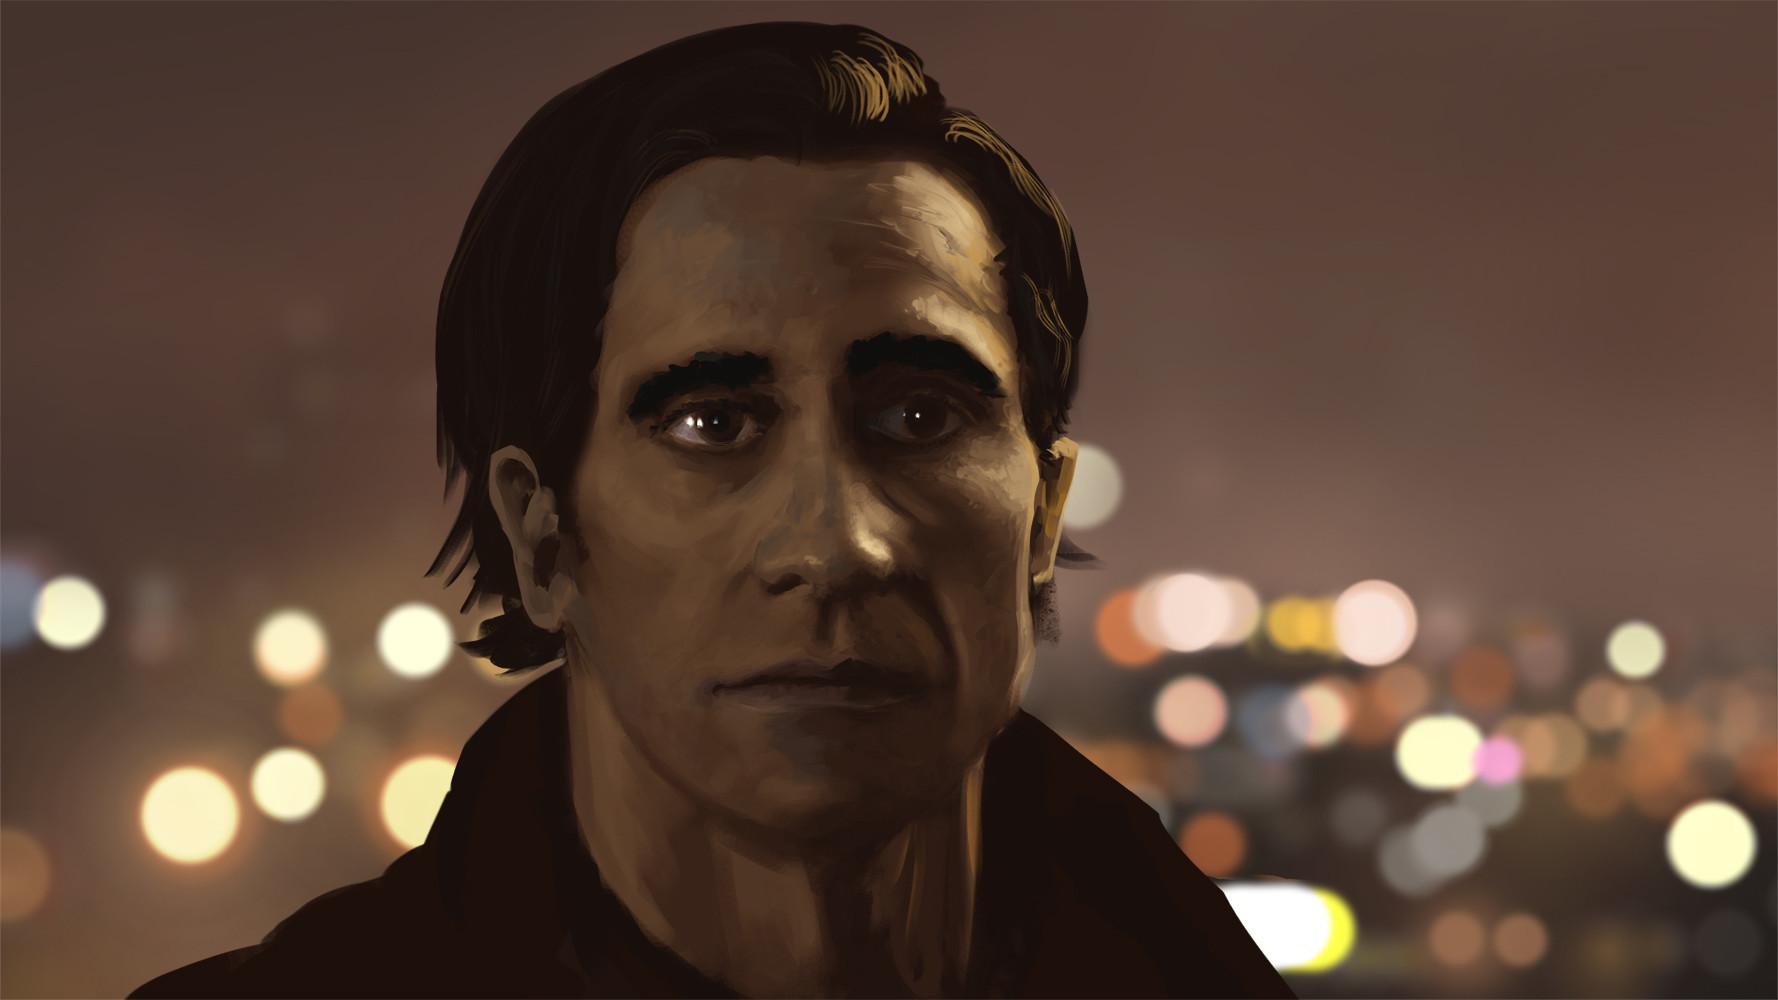 Jack stevens jakegyllenhaal study